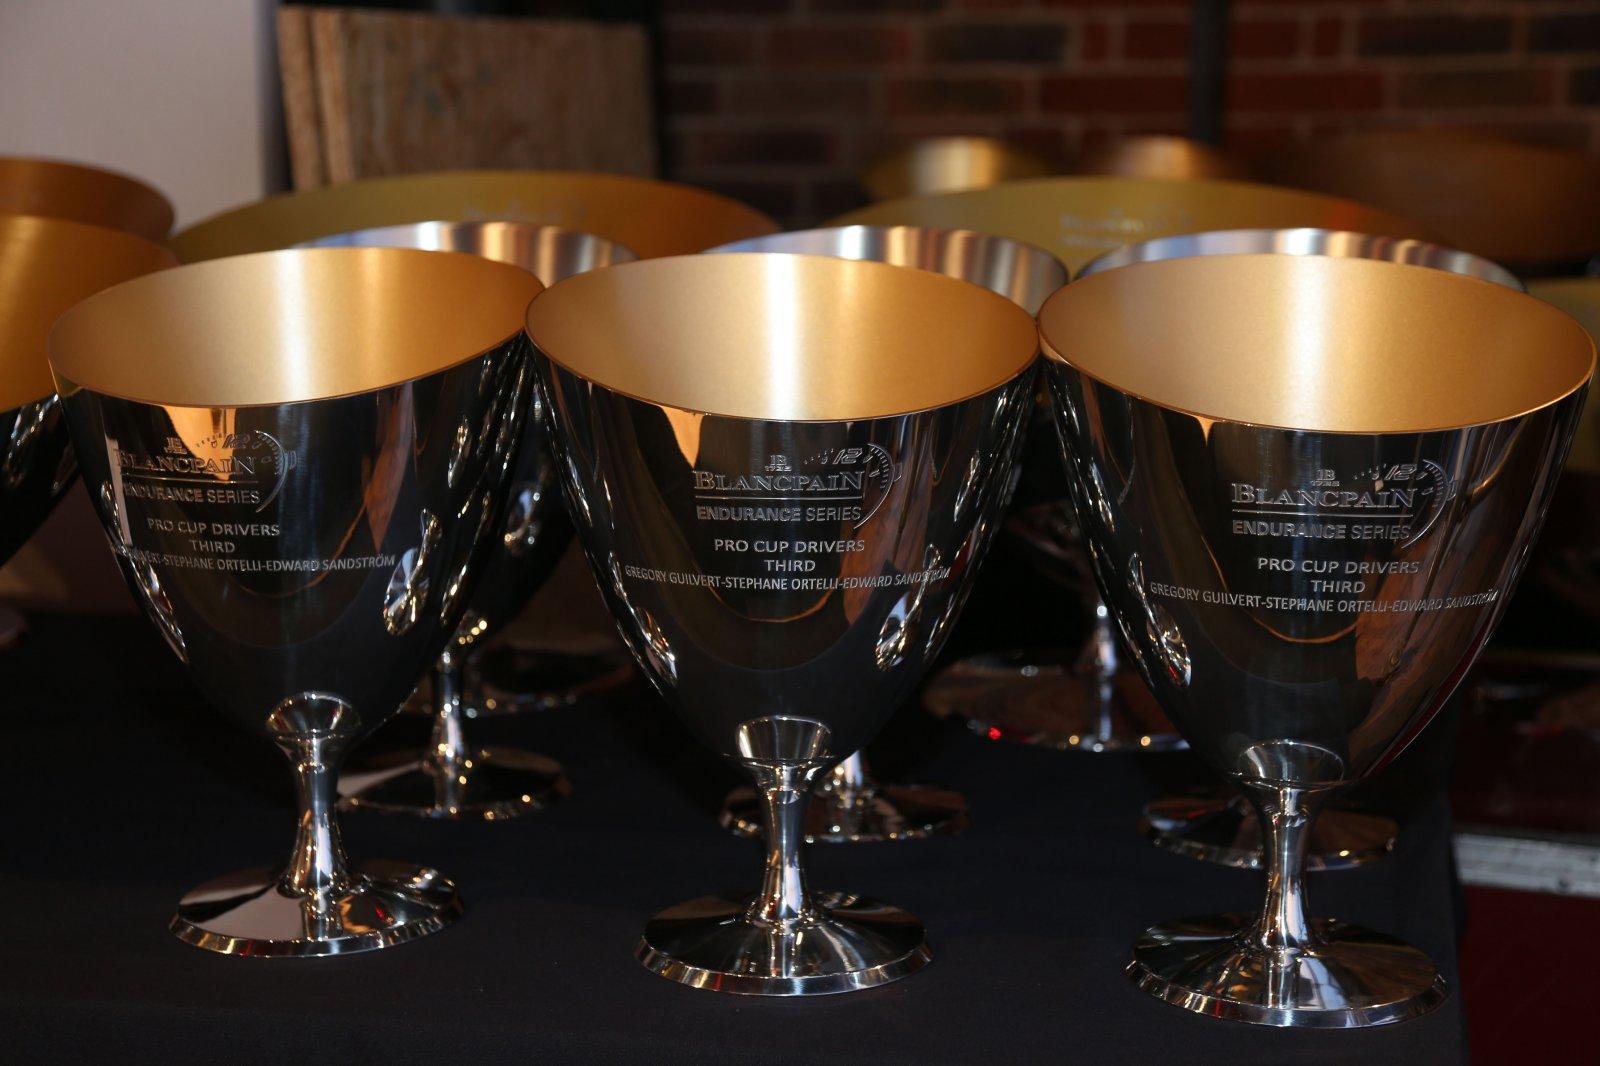 SRO Award Ceremony brings glamorous end to an entertaining 2014 season